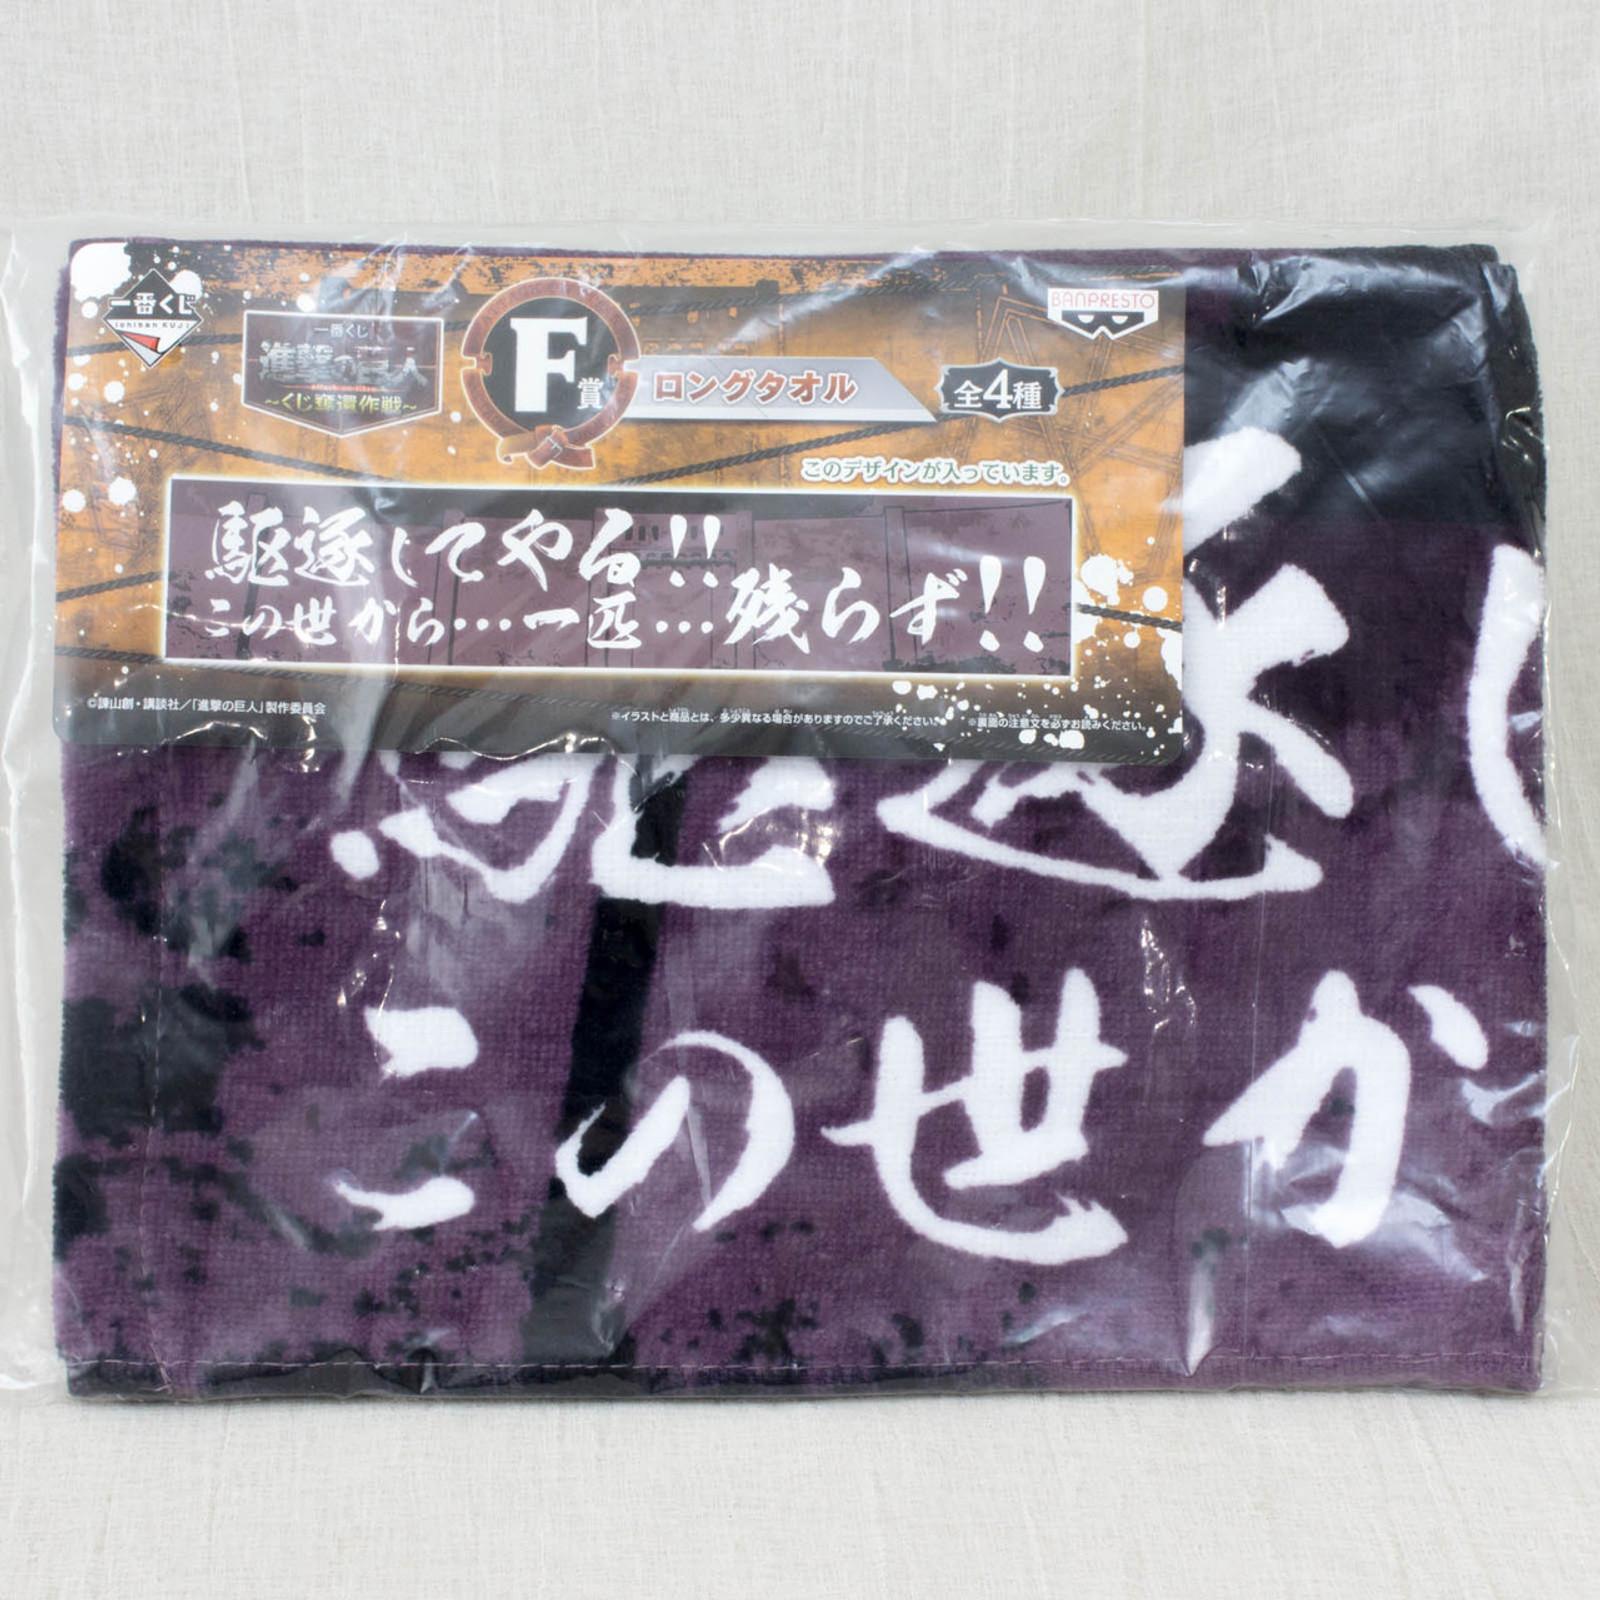 Attack on Titan Long Towel 40 inch Purple Banpresto JAPAN ANIME MANGA